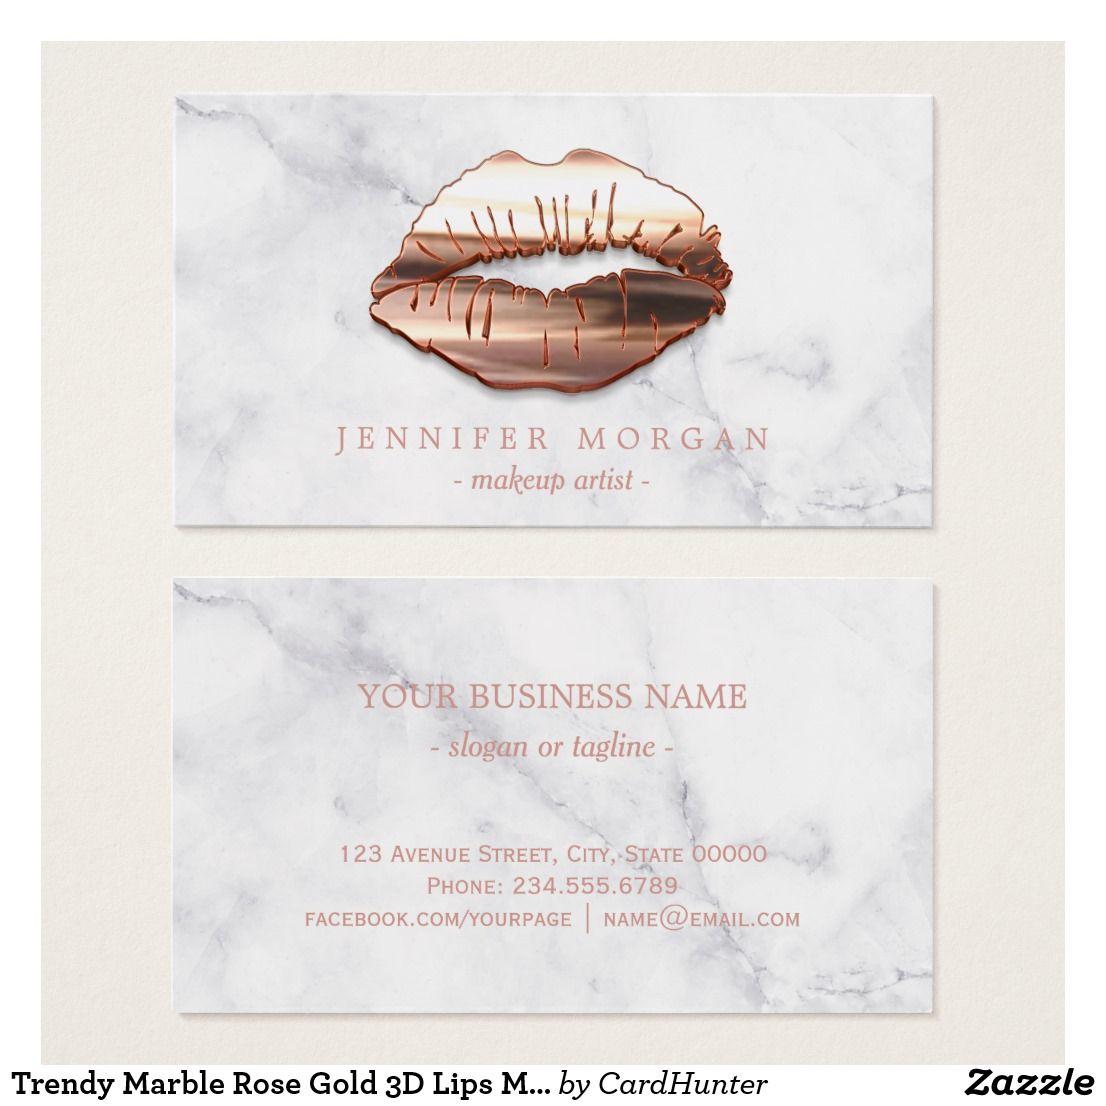 Trendy Marble Rose Gold 3D Lips Makeup Artist Business Card | Makeup ...